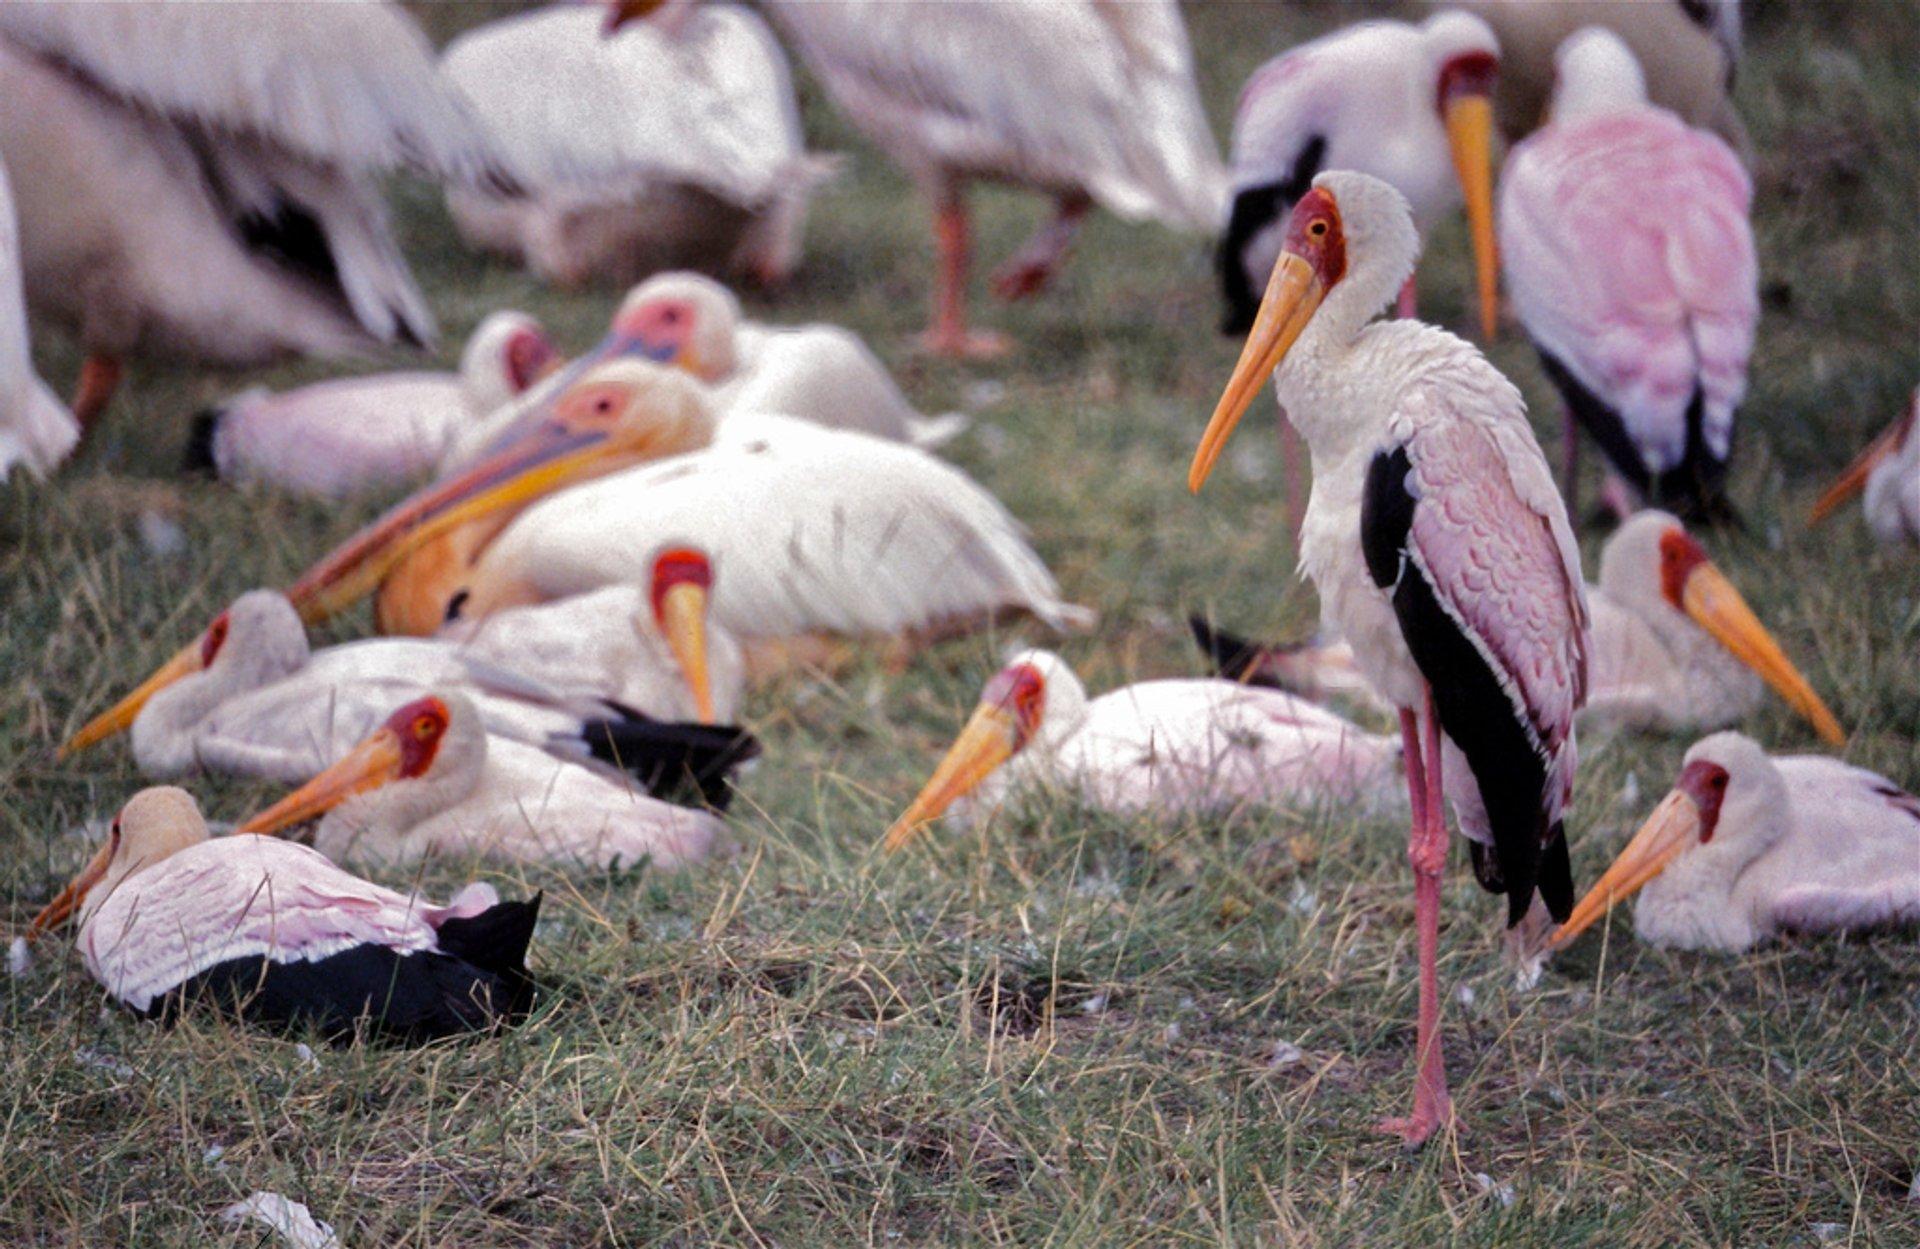 Yellow-billed Storks (Mycteria ibis) 2019